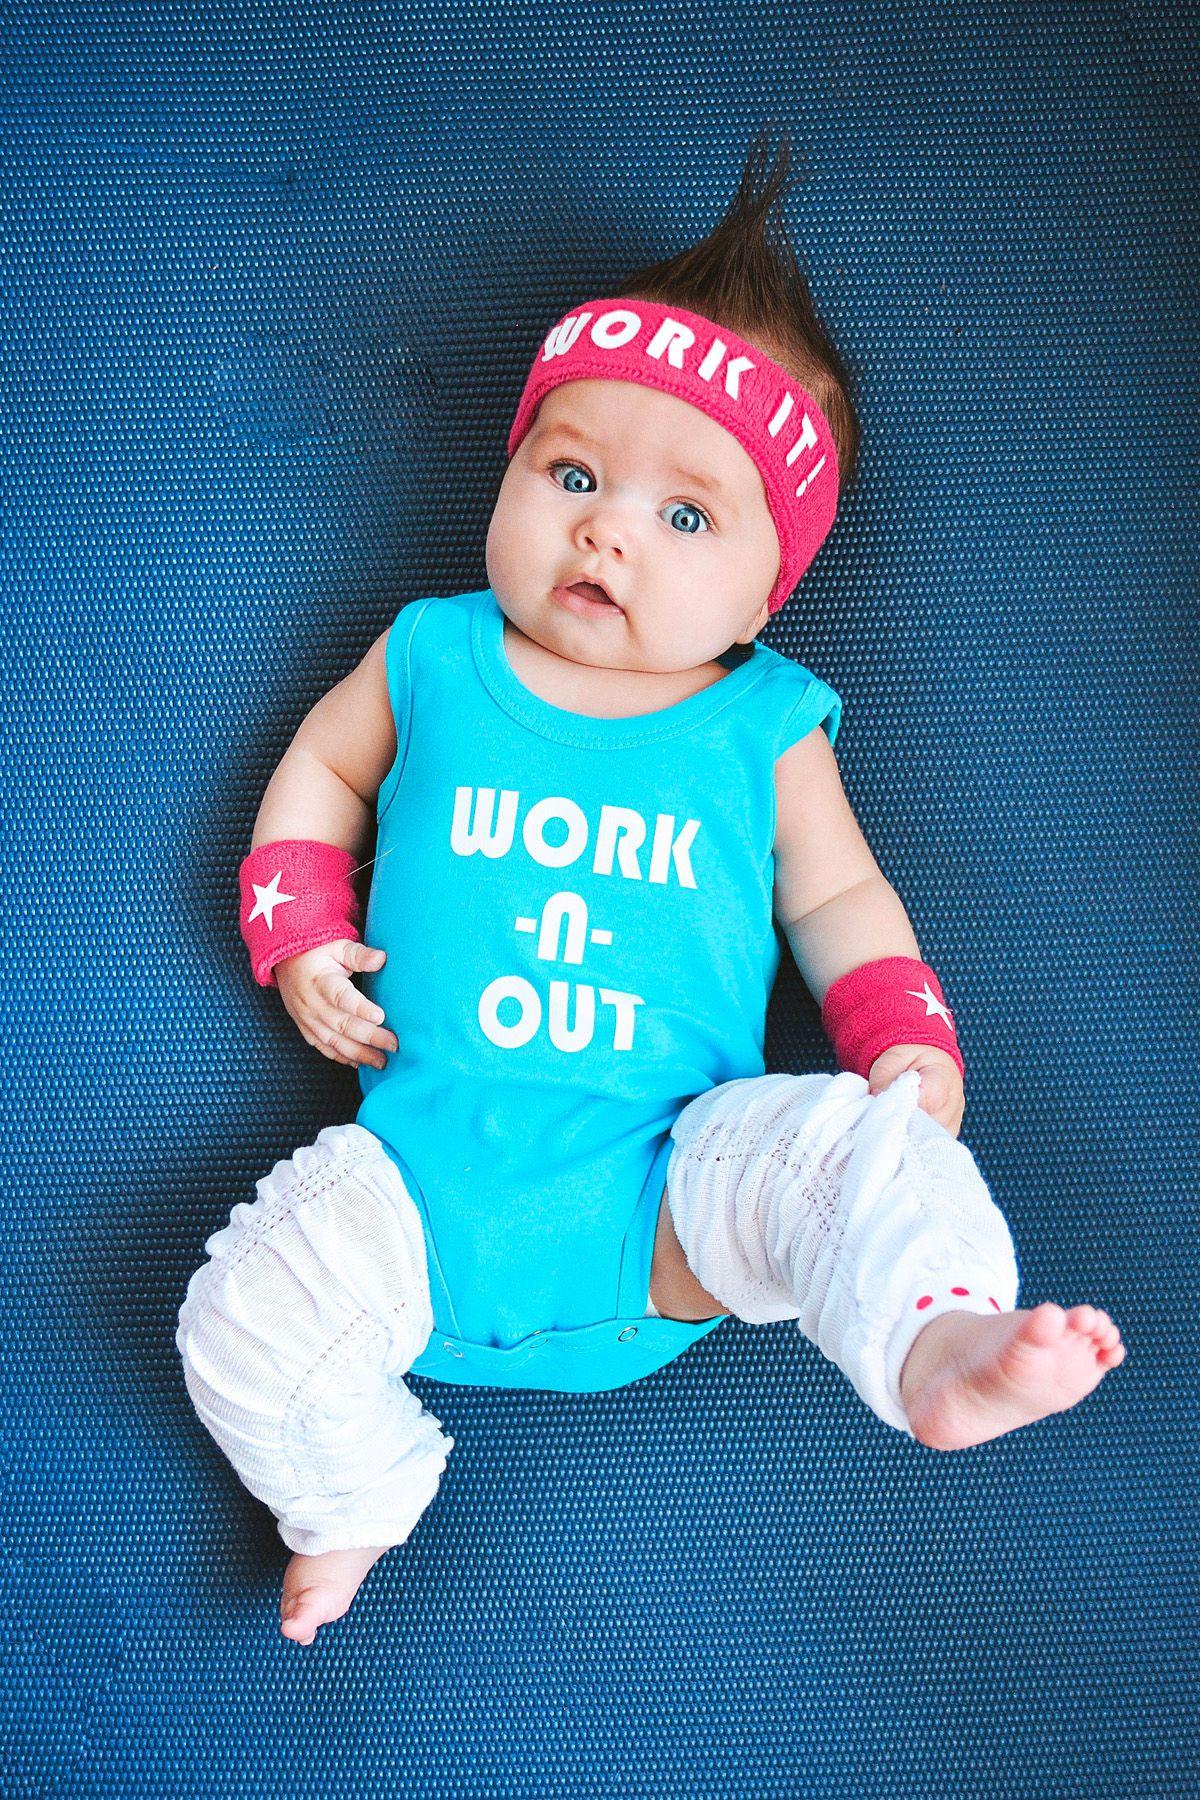 Creative baby girl photoshoot ideas at home